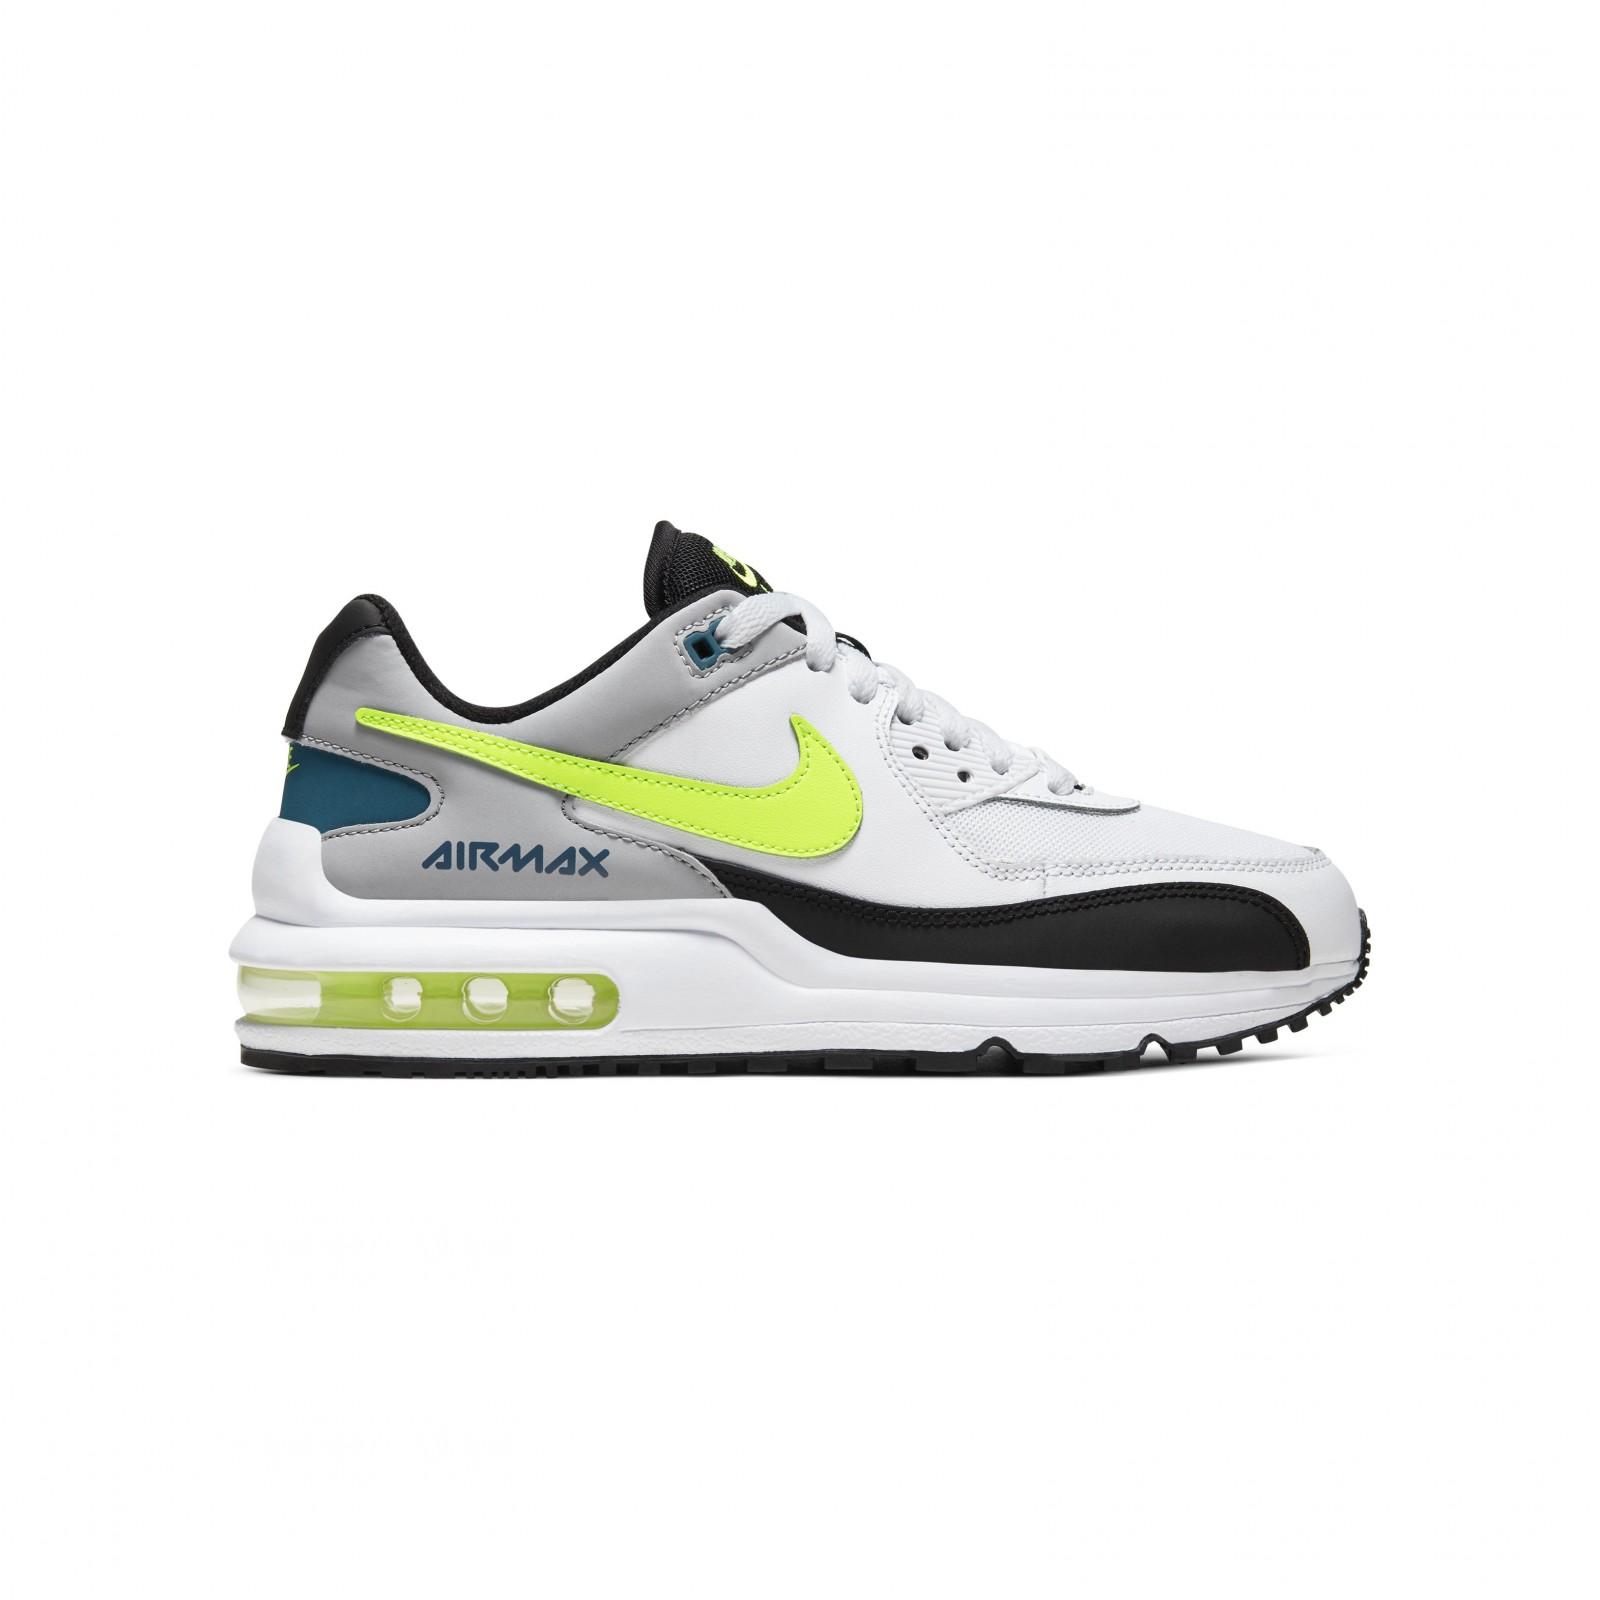 Nike air max wright gs WHITE/VOLT-BLACK-WOLF GREY